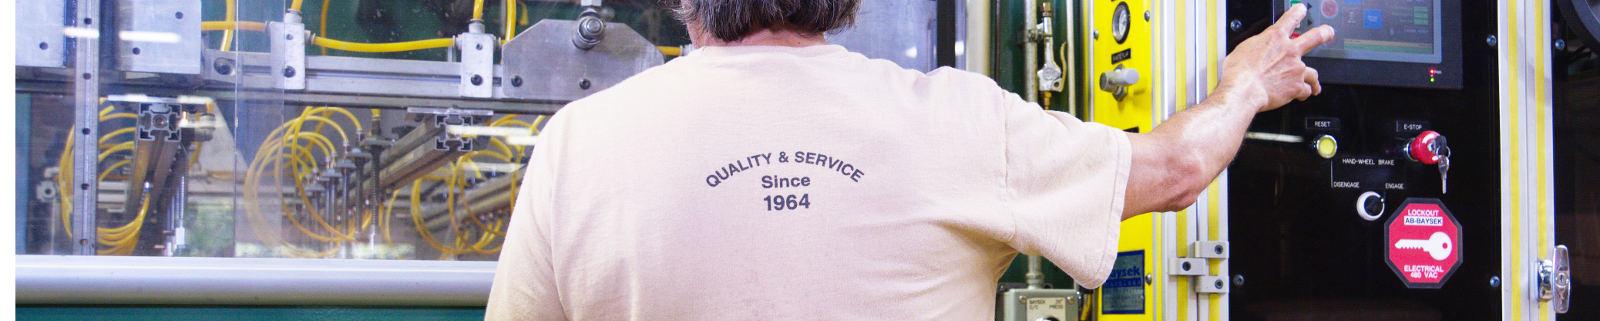 quality & service